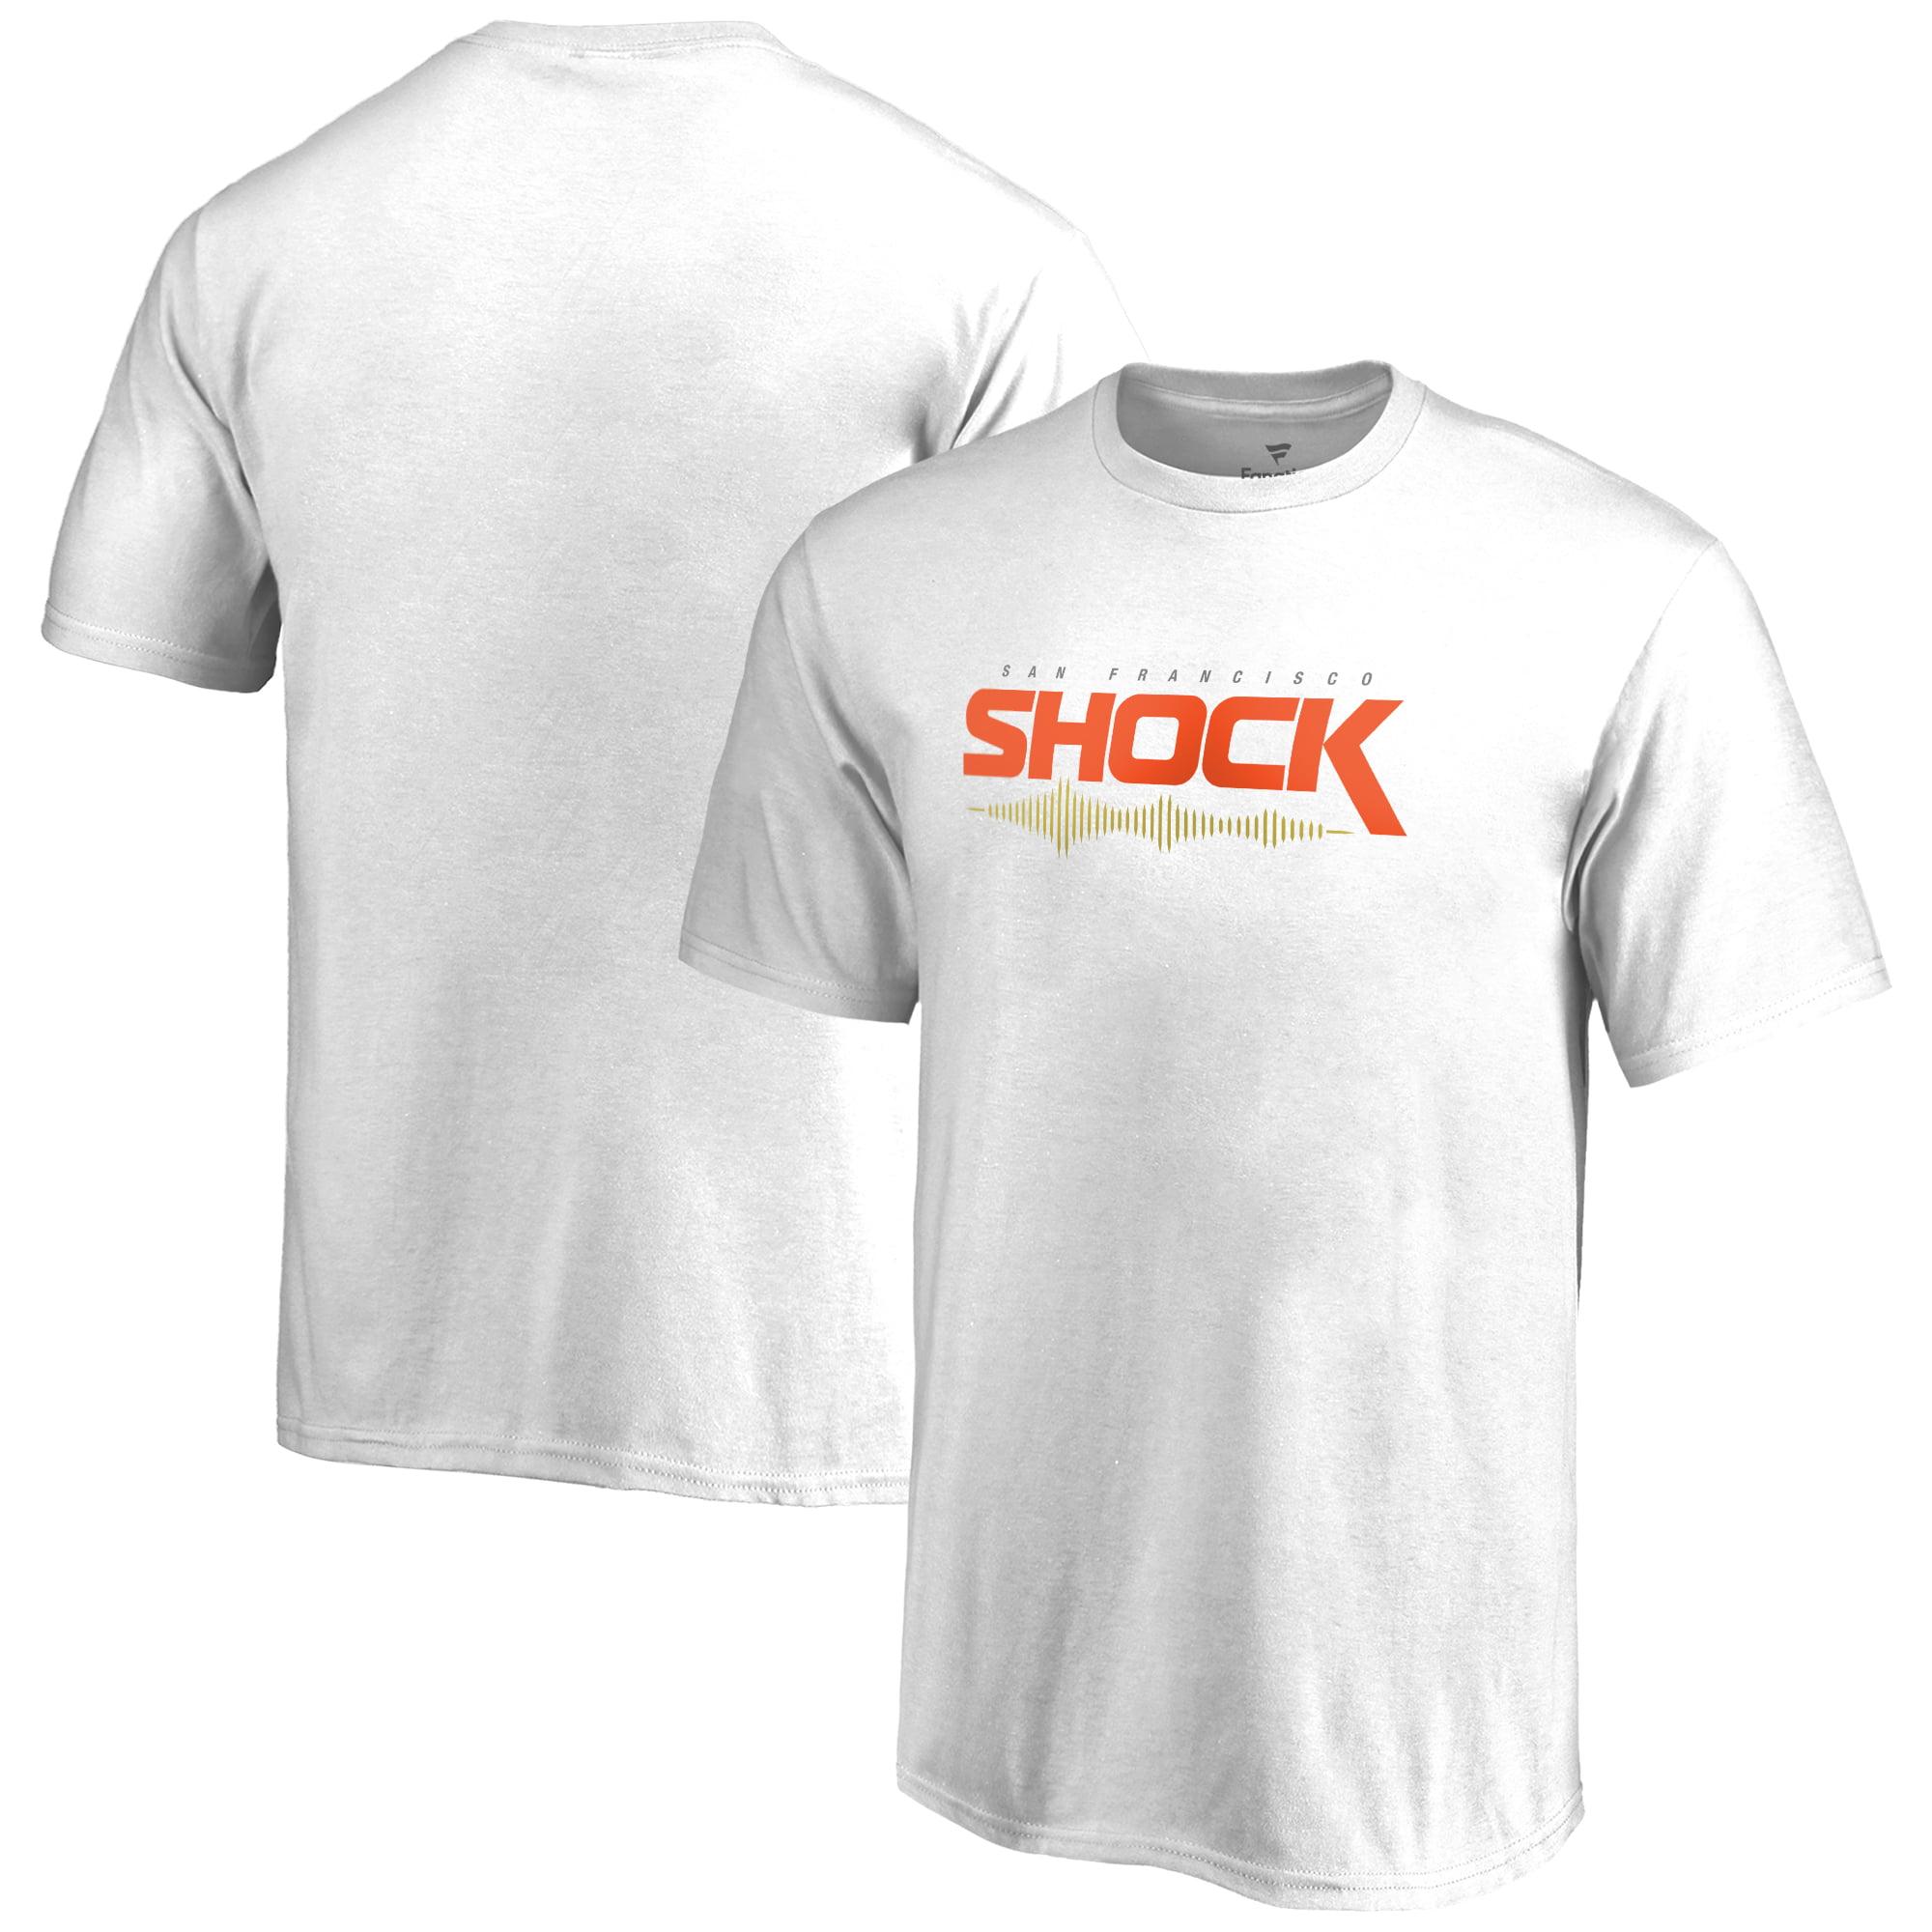 San Francisco Shock Fanatics Branded Youth Team Identity T-Shirt - White